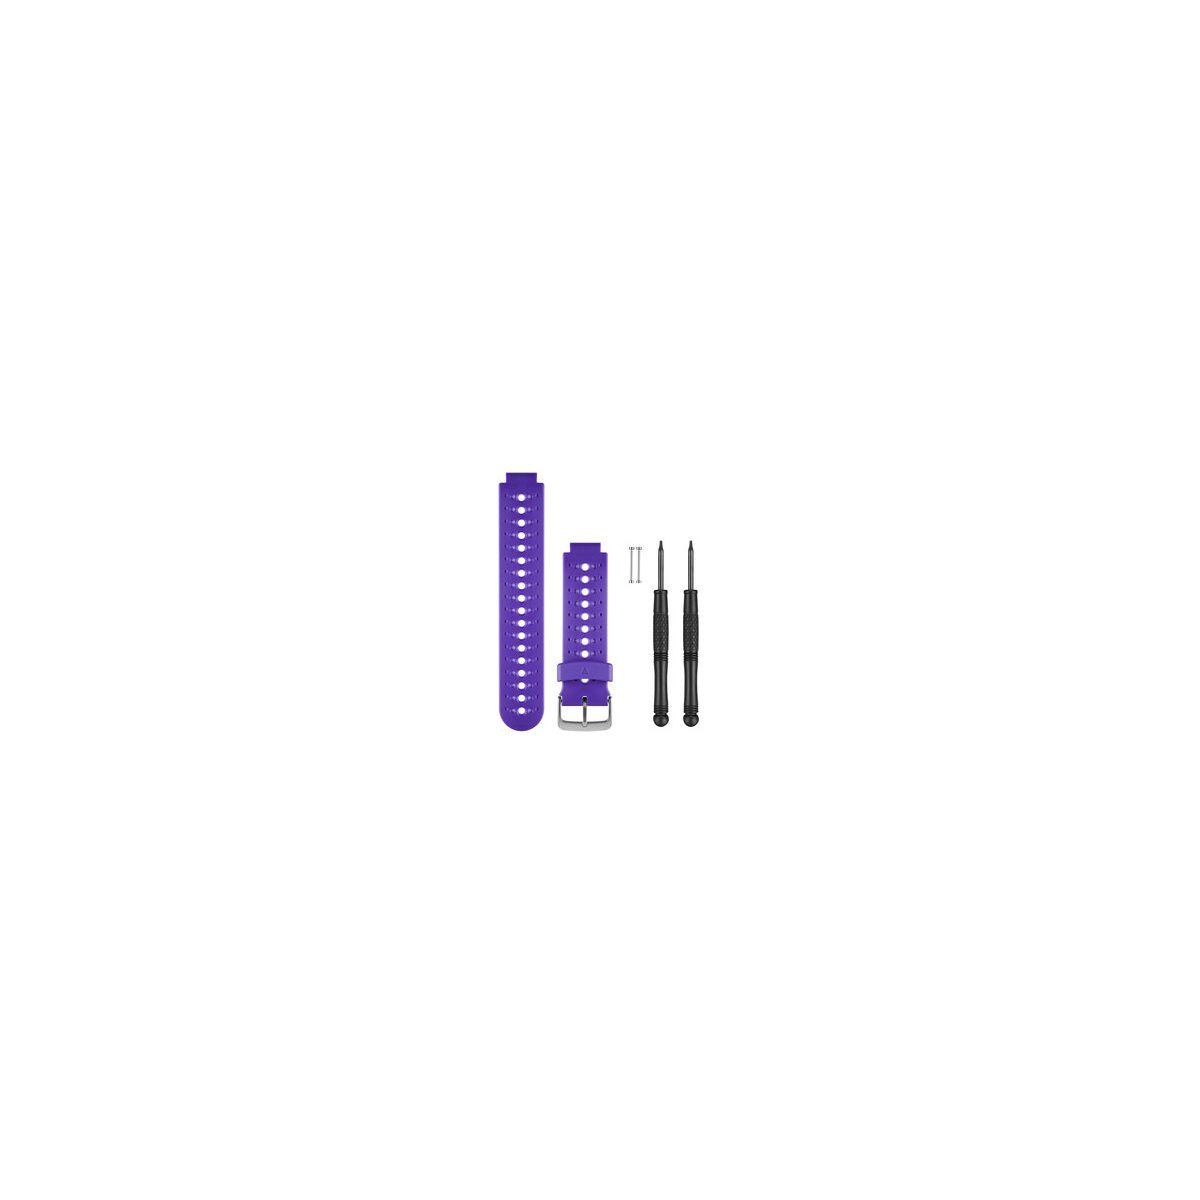 Bracelet GARMIN Violet - Forerunner 230